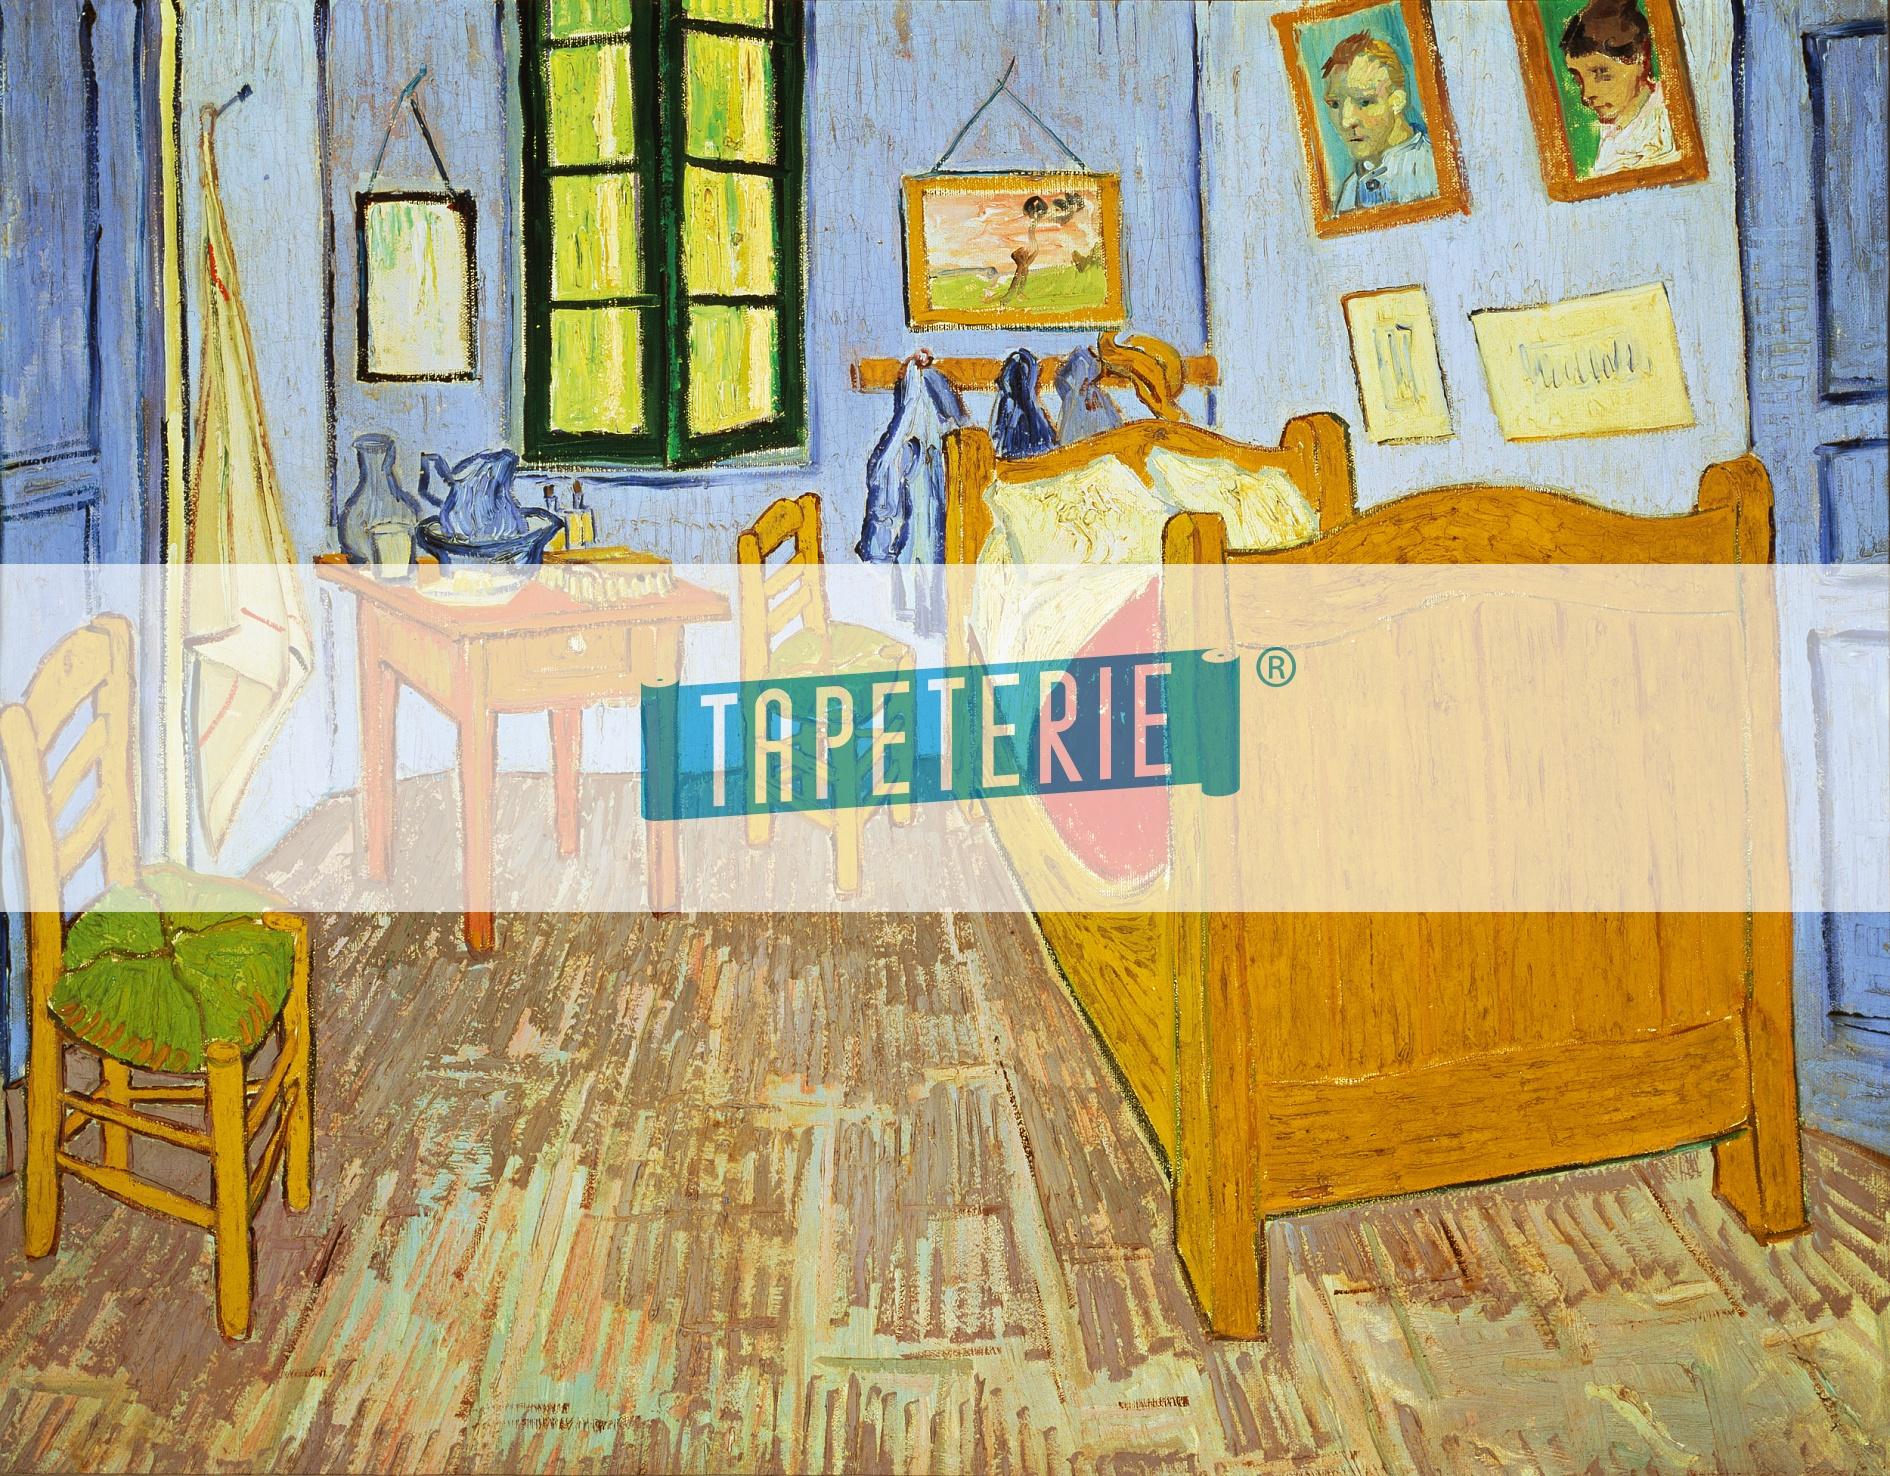 Schlafzimmer In Arles : Schlafzimmer In Arles  Kunst Tapete Van Goghs Schlafzimmer in Arles